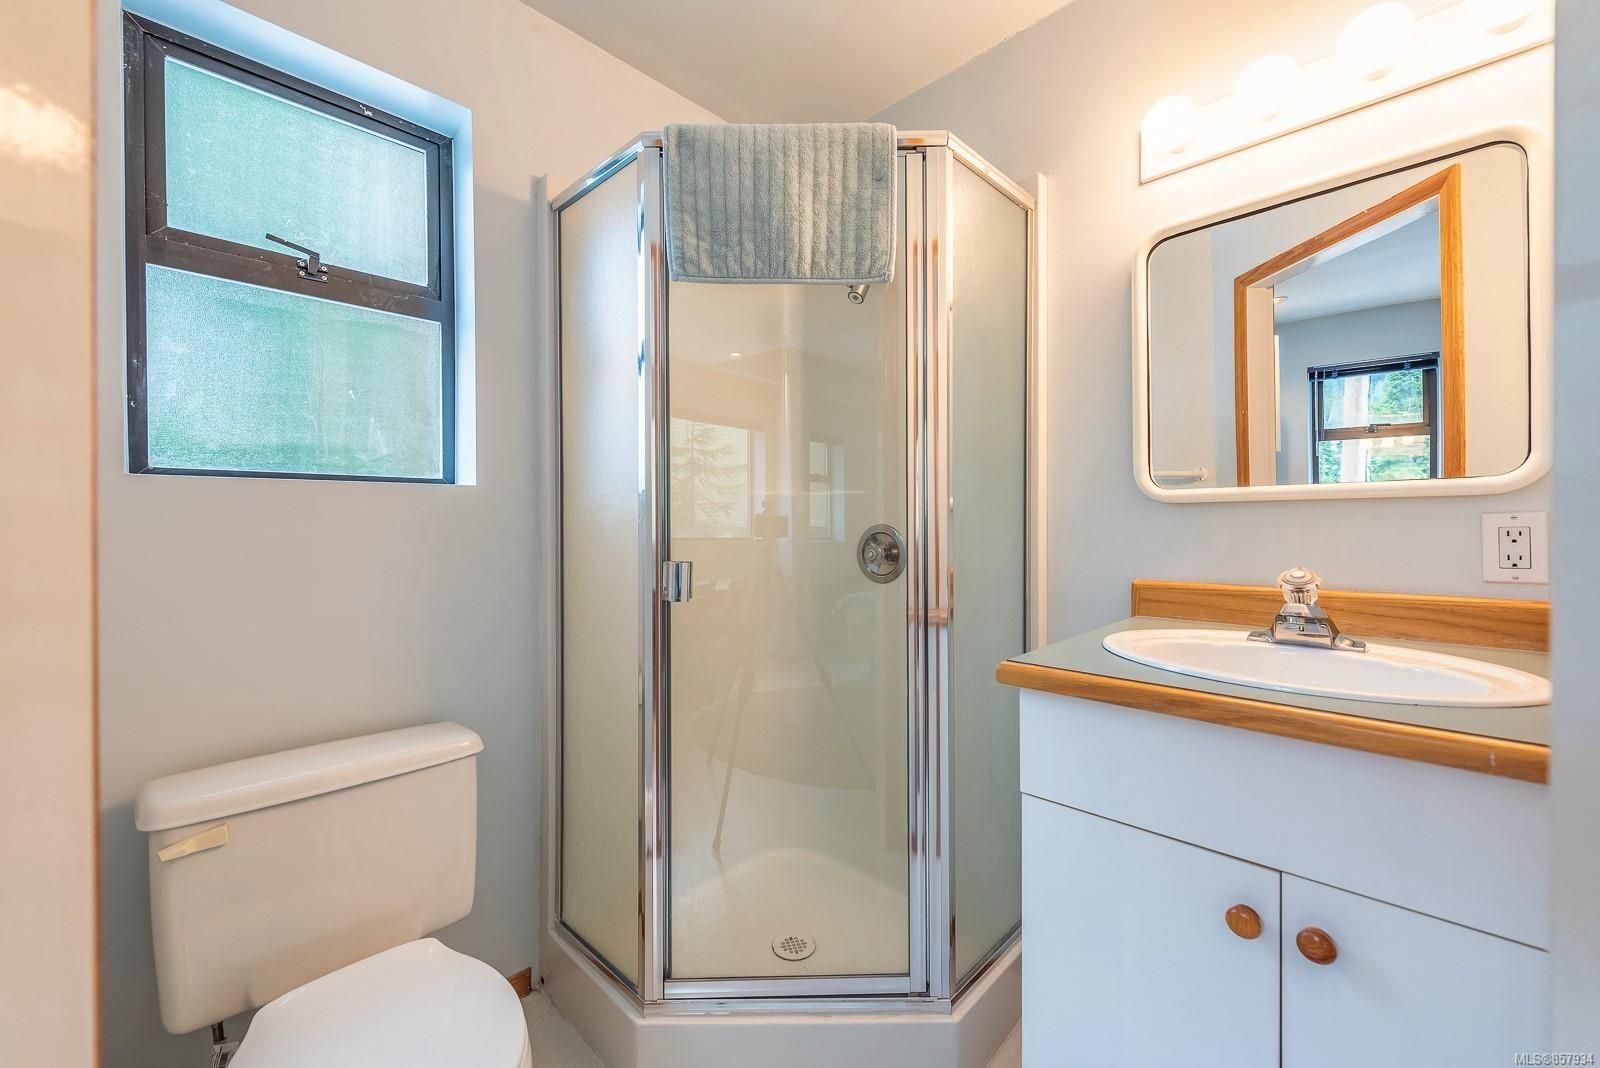 Photo 18: Photos: 998 STRATA Way in : CV Mt Washington House for sale (Comox Valley)  : MLS®# 857934